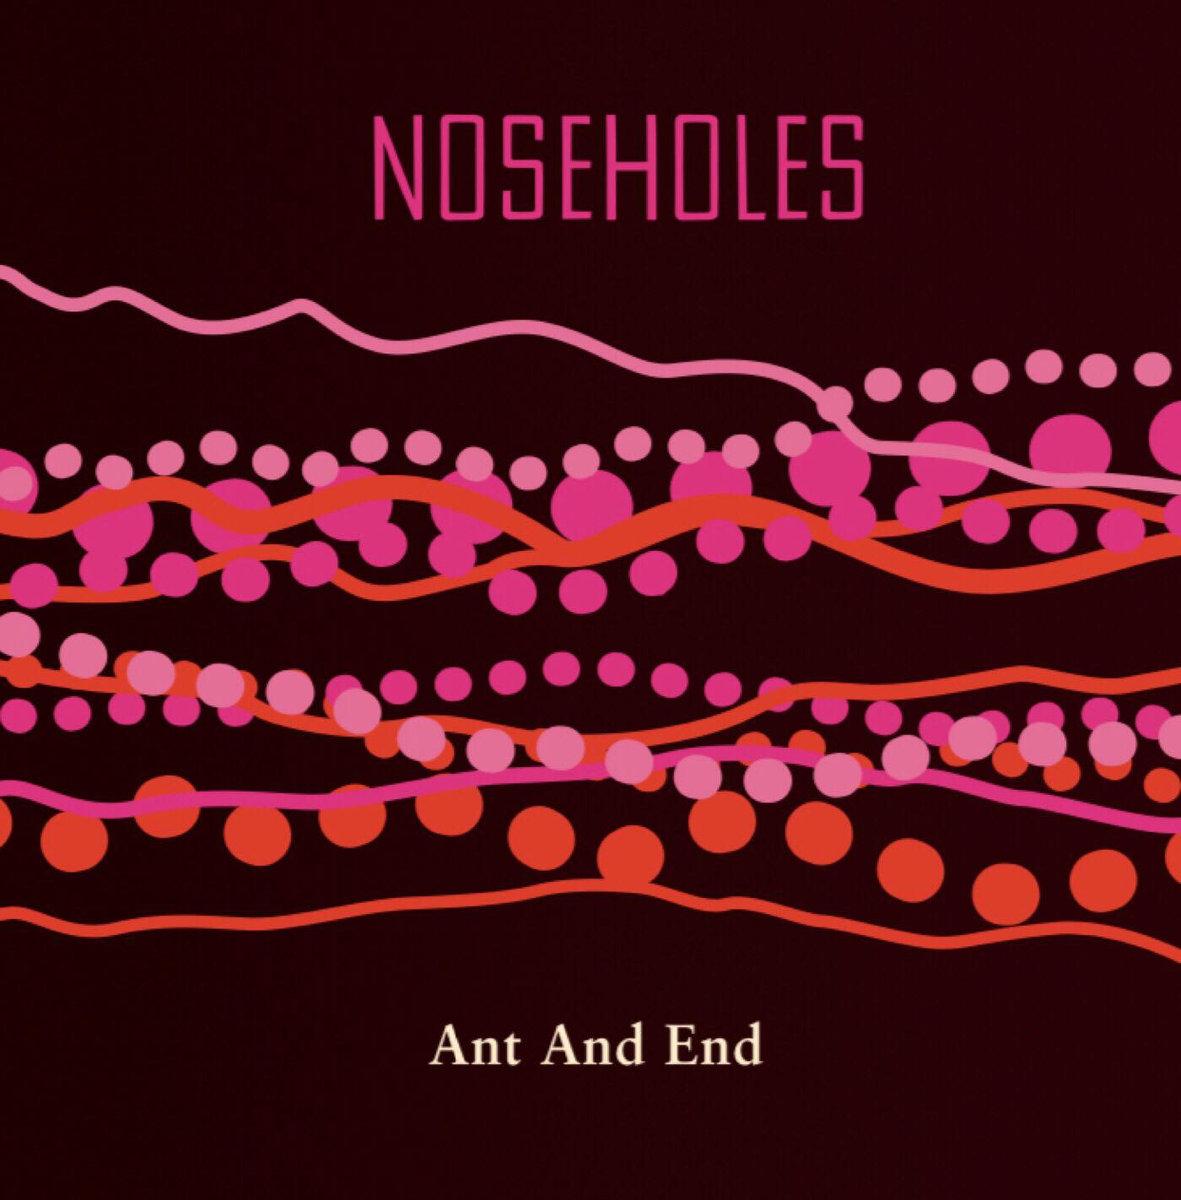 Noseholes